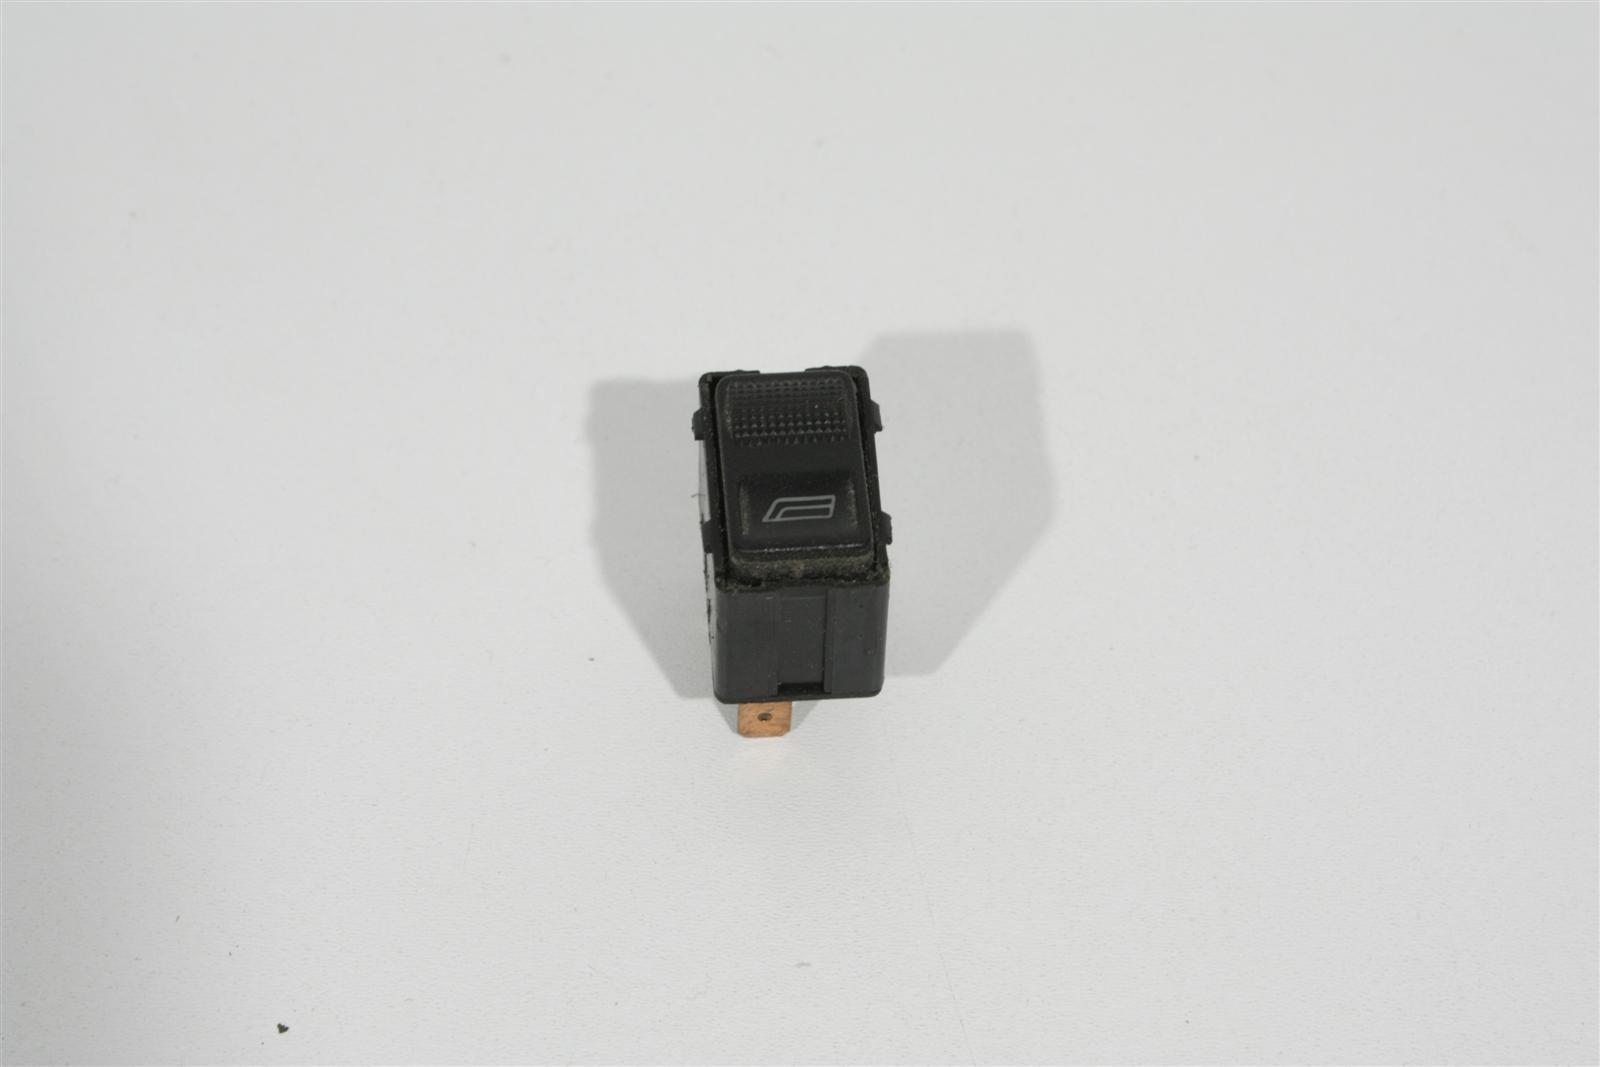 Audi 80/90/100/200/V8/A6 C4 Schalter elektrische Fensterheber 893959855